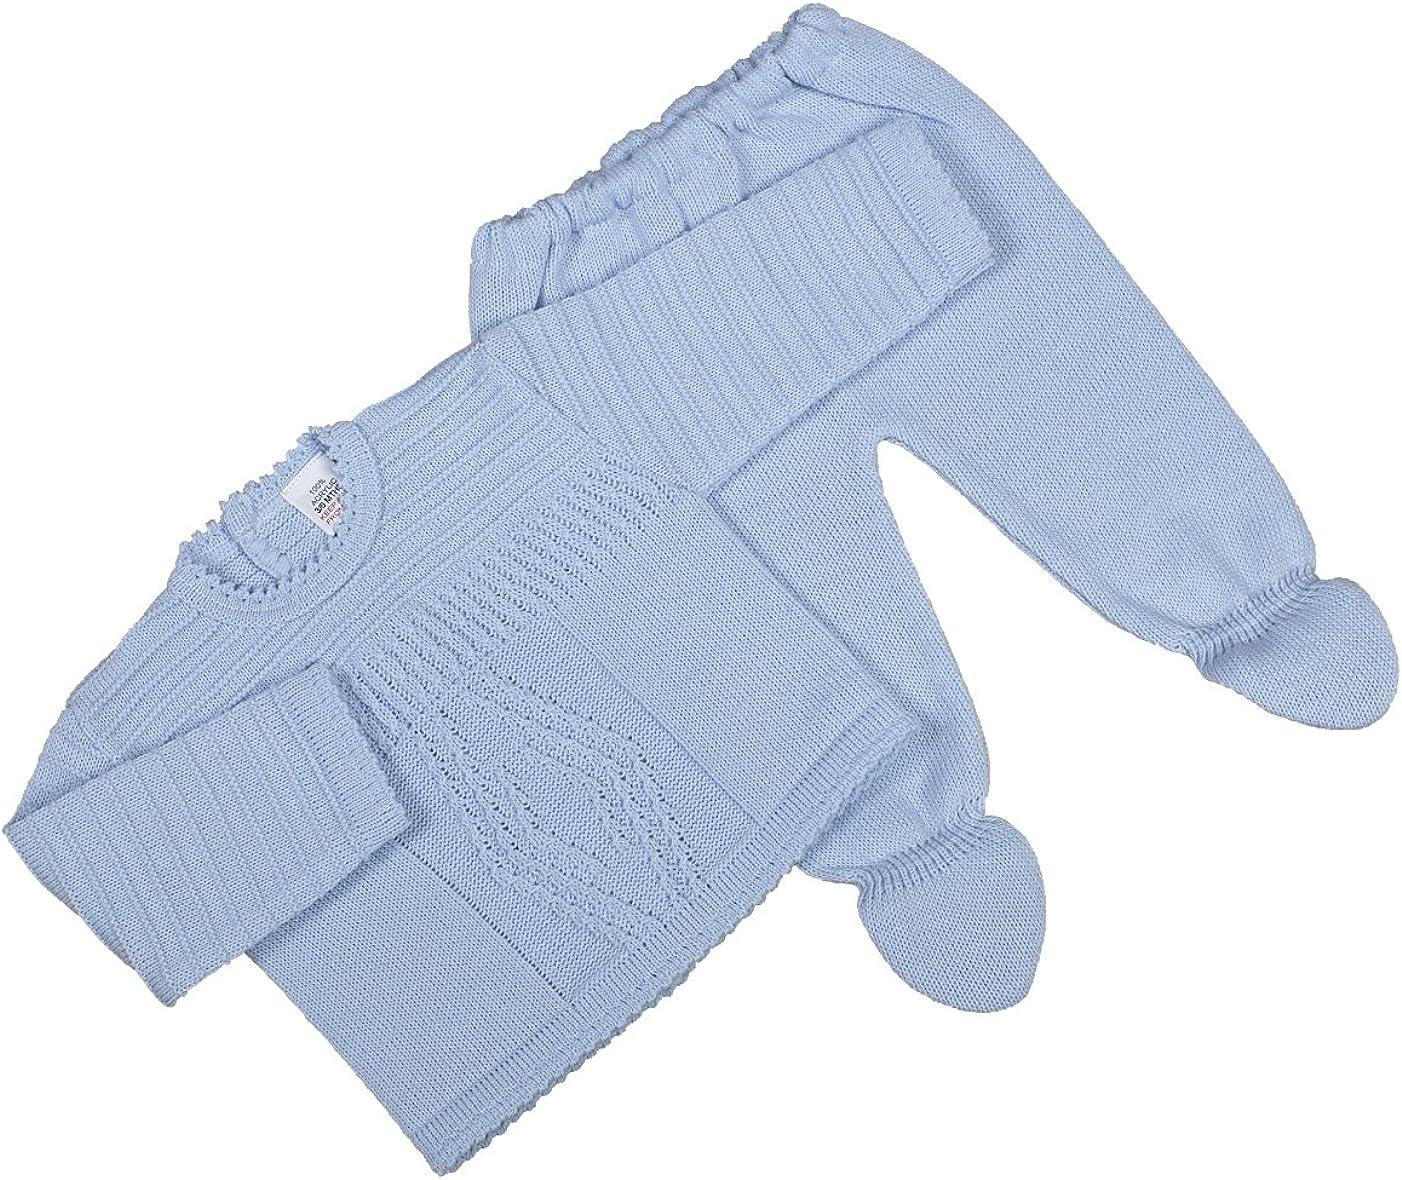 Dandelion Baby Boys 0-24m A1513B Acrylic Long Sleeve Clothing Set